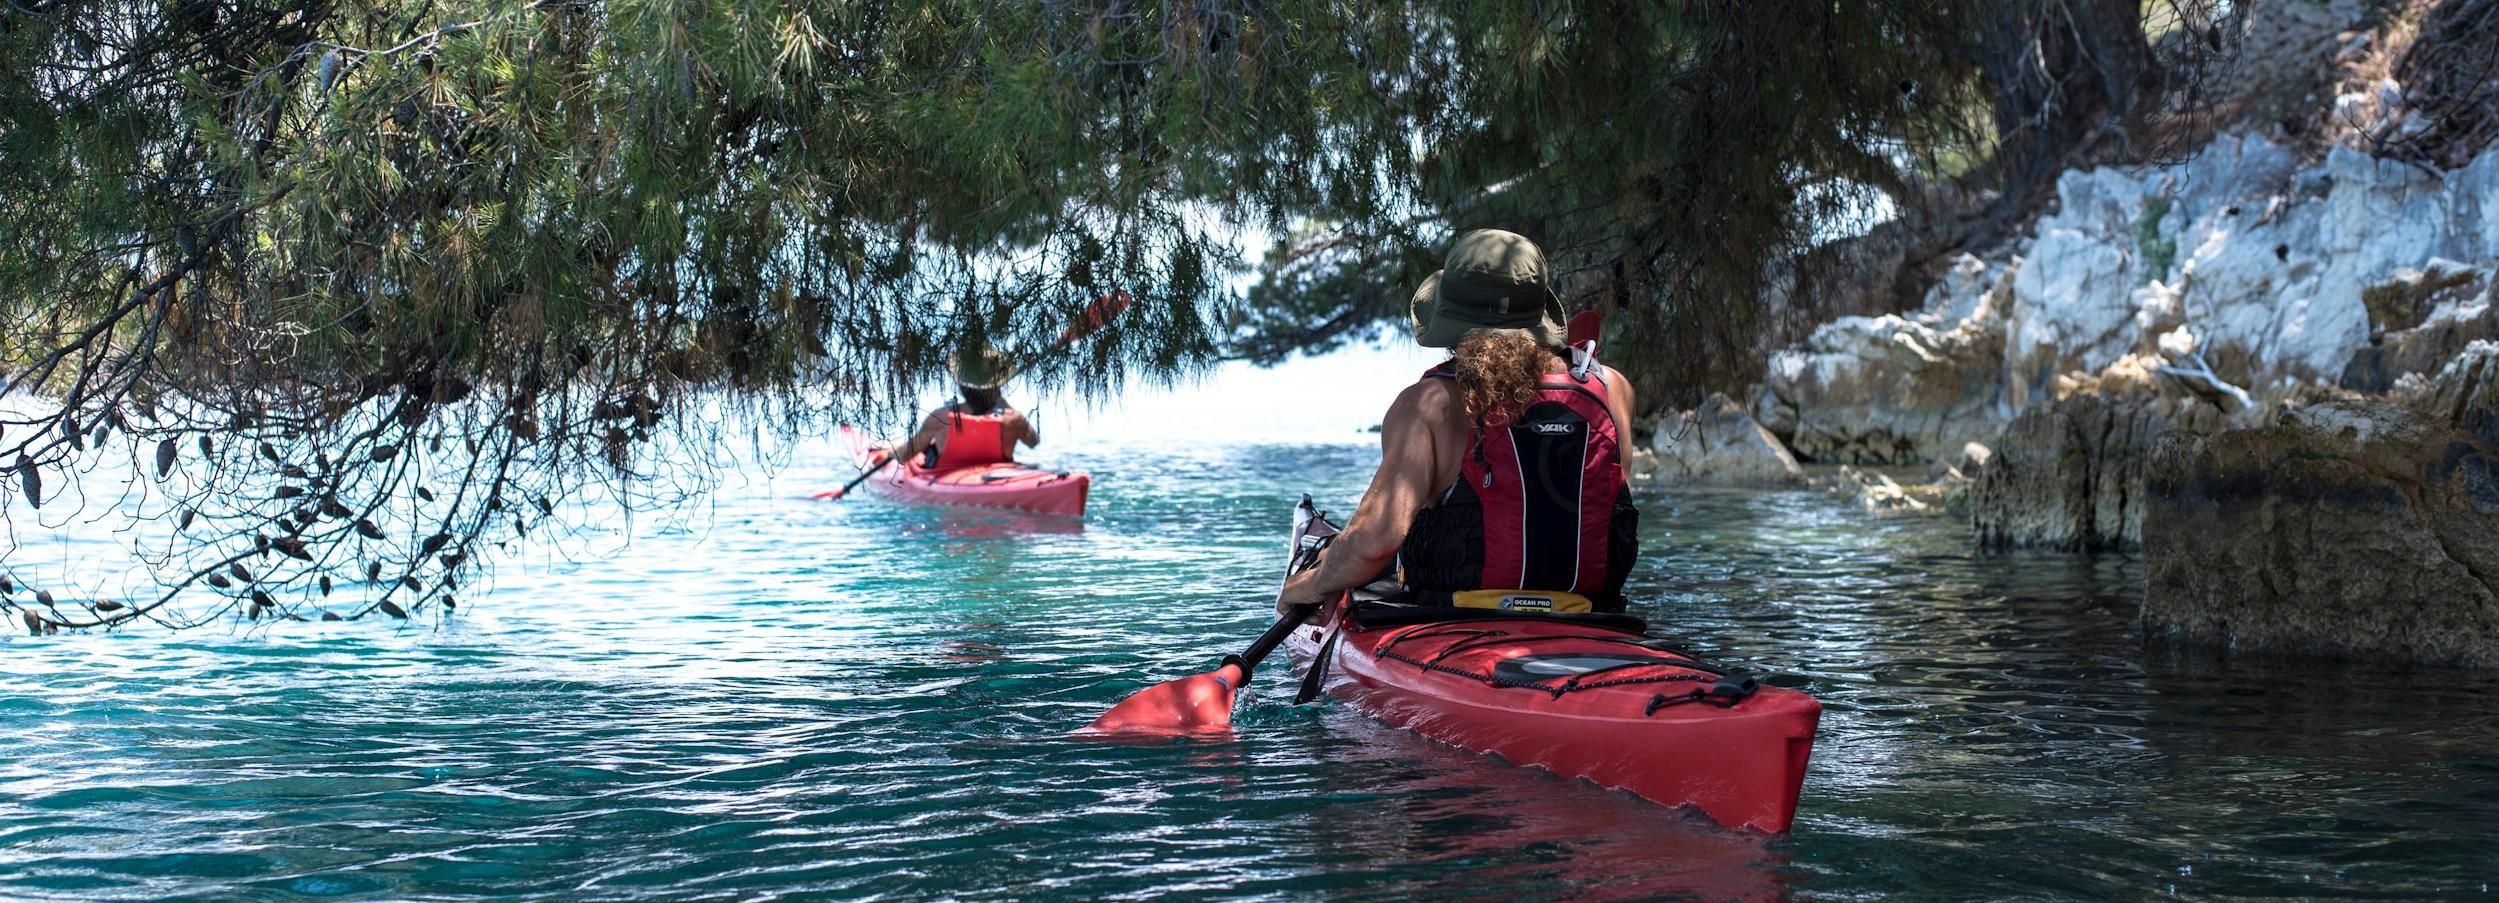 Lefkada: Full Day Sea Kayaking Tour